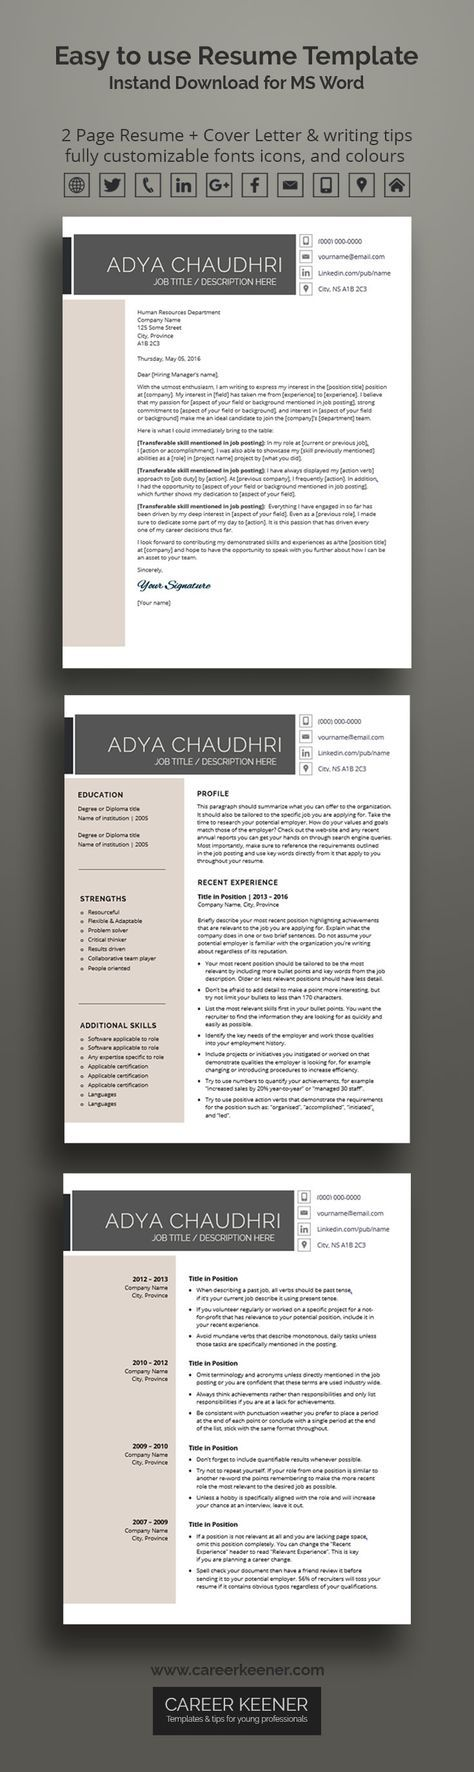 Modern Resume Template Resume + Cover Letter for MS Word